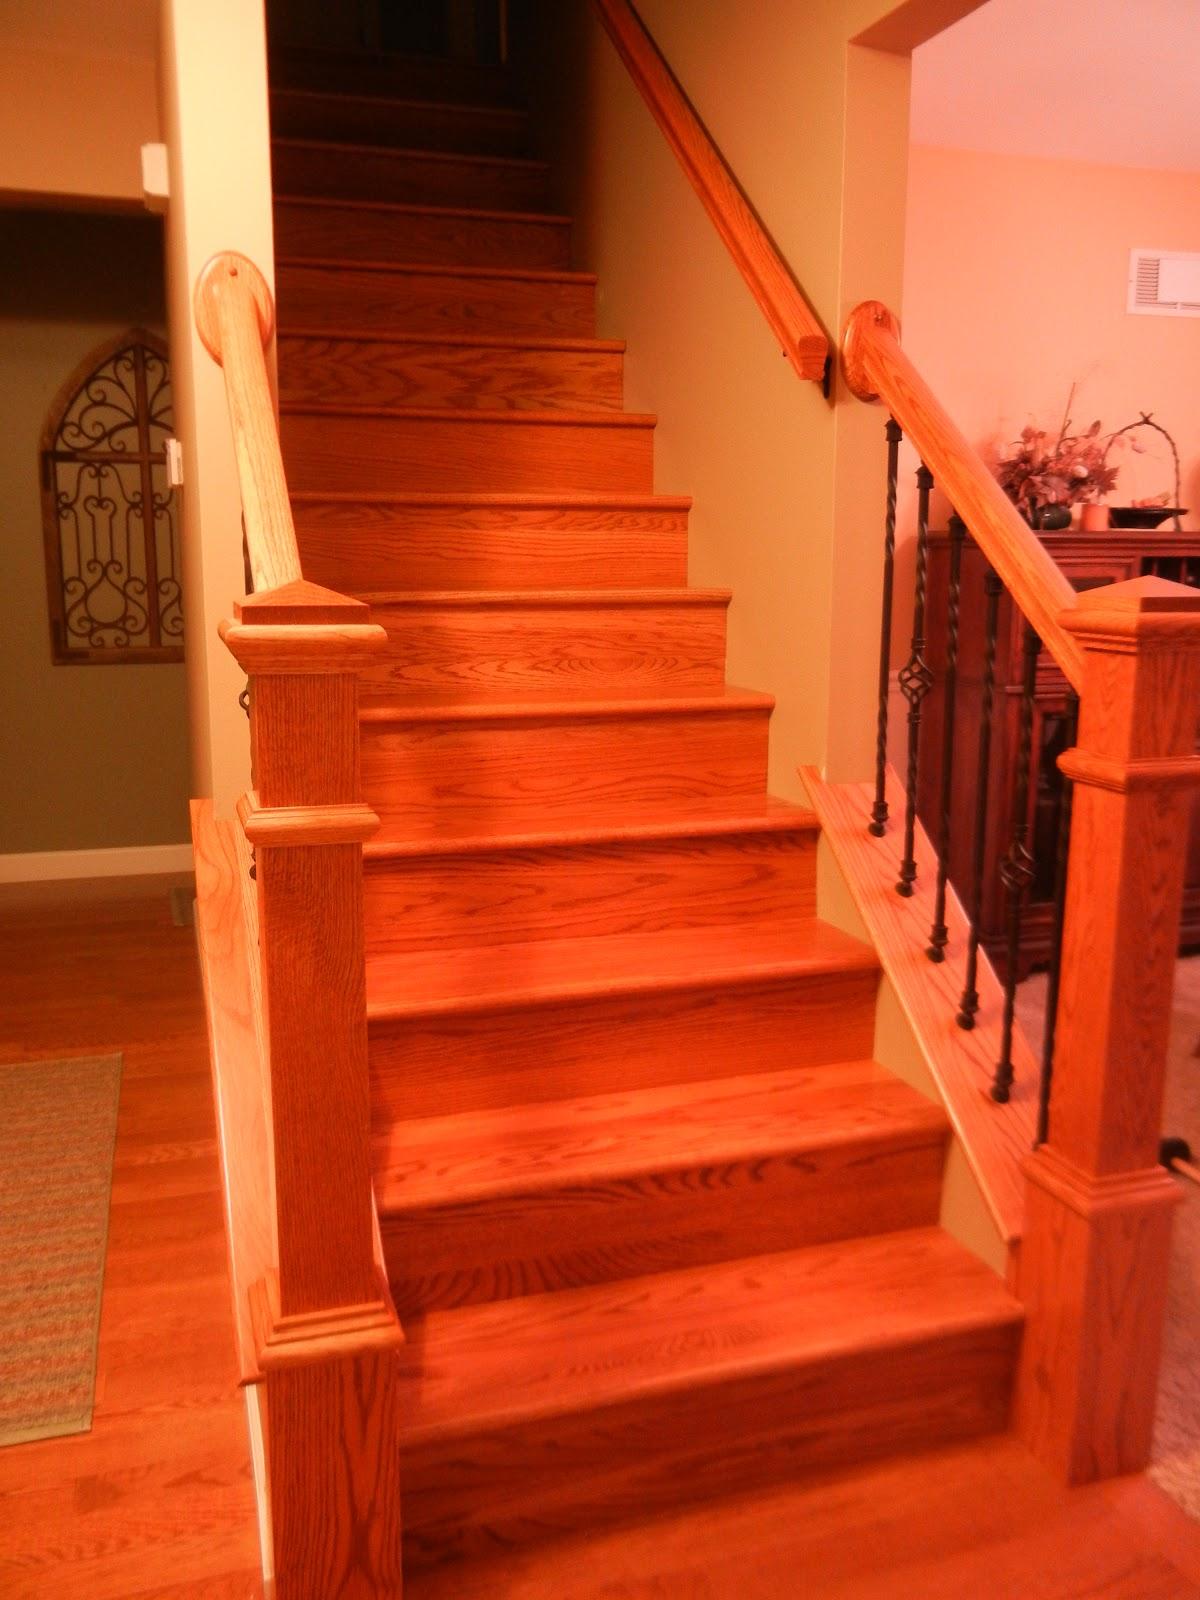 renovation diy midwest floors home bruce minwax cherry oak matching stain to gunstock hardwood